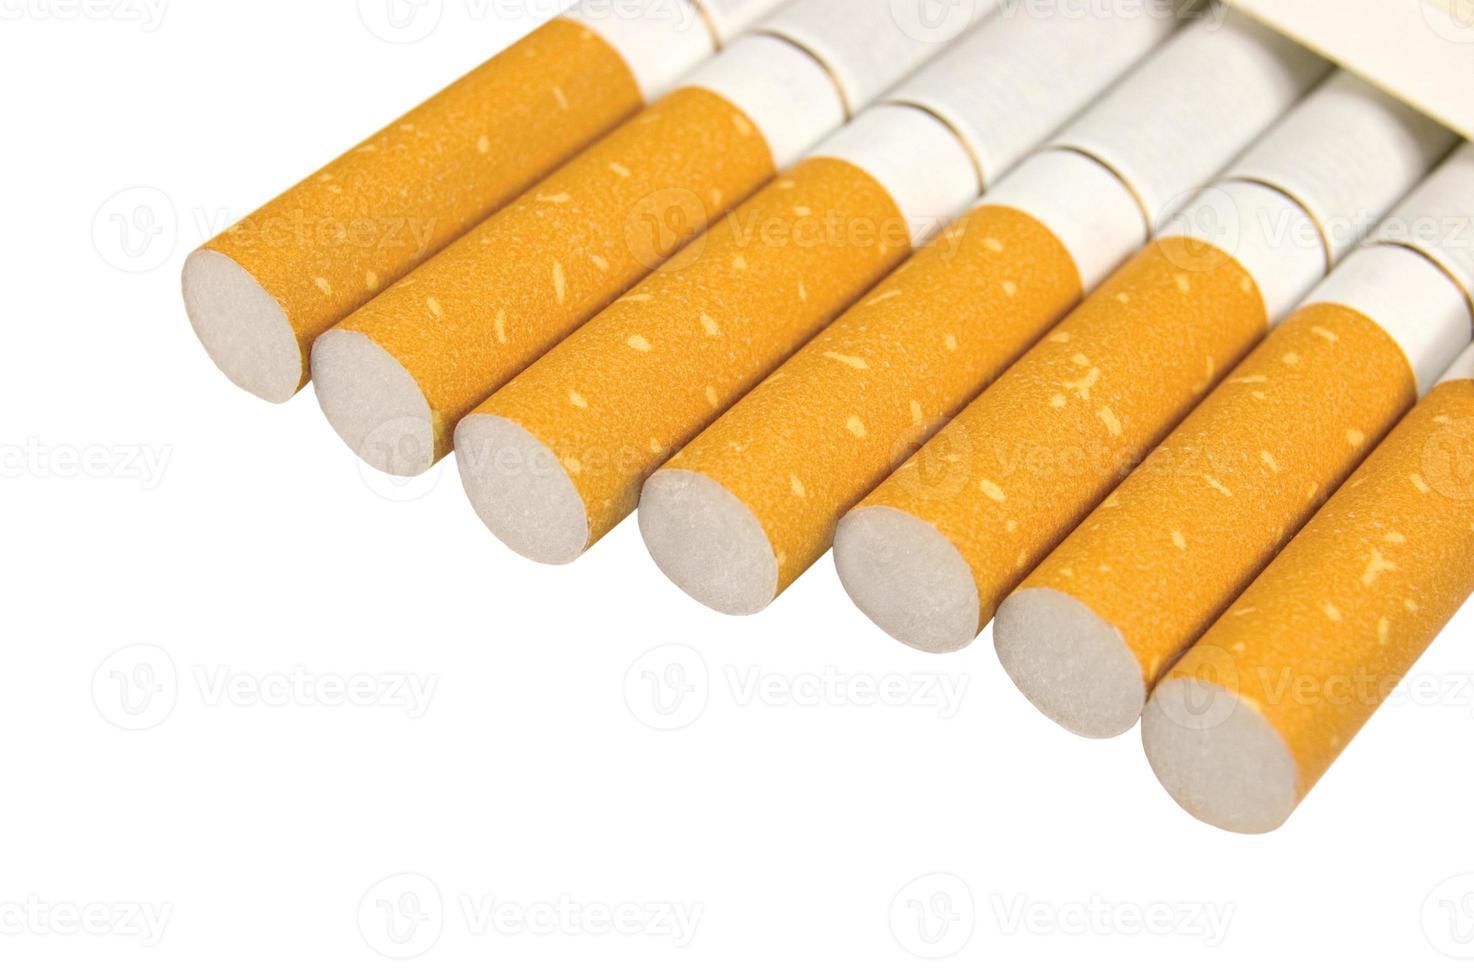 Klasse ein Filter Zigaretten Nahaufnahme, große isolierte Makro-Studio-Aufnahme foto